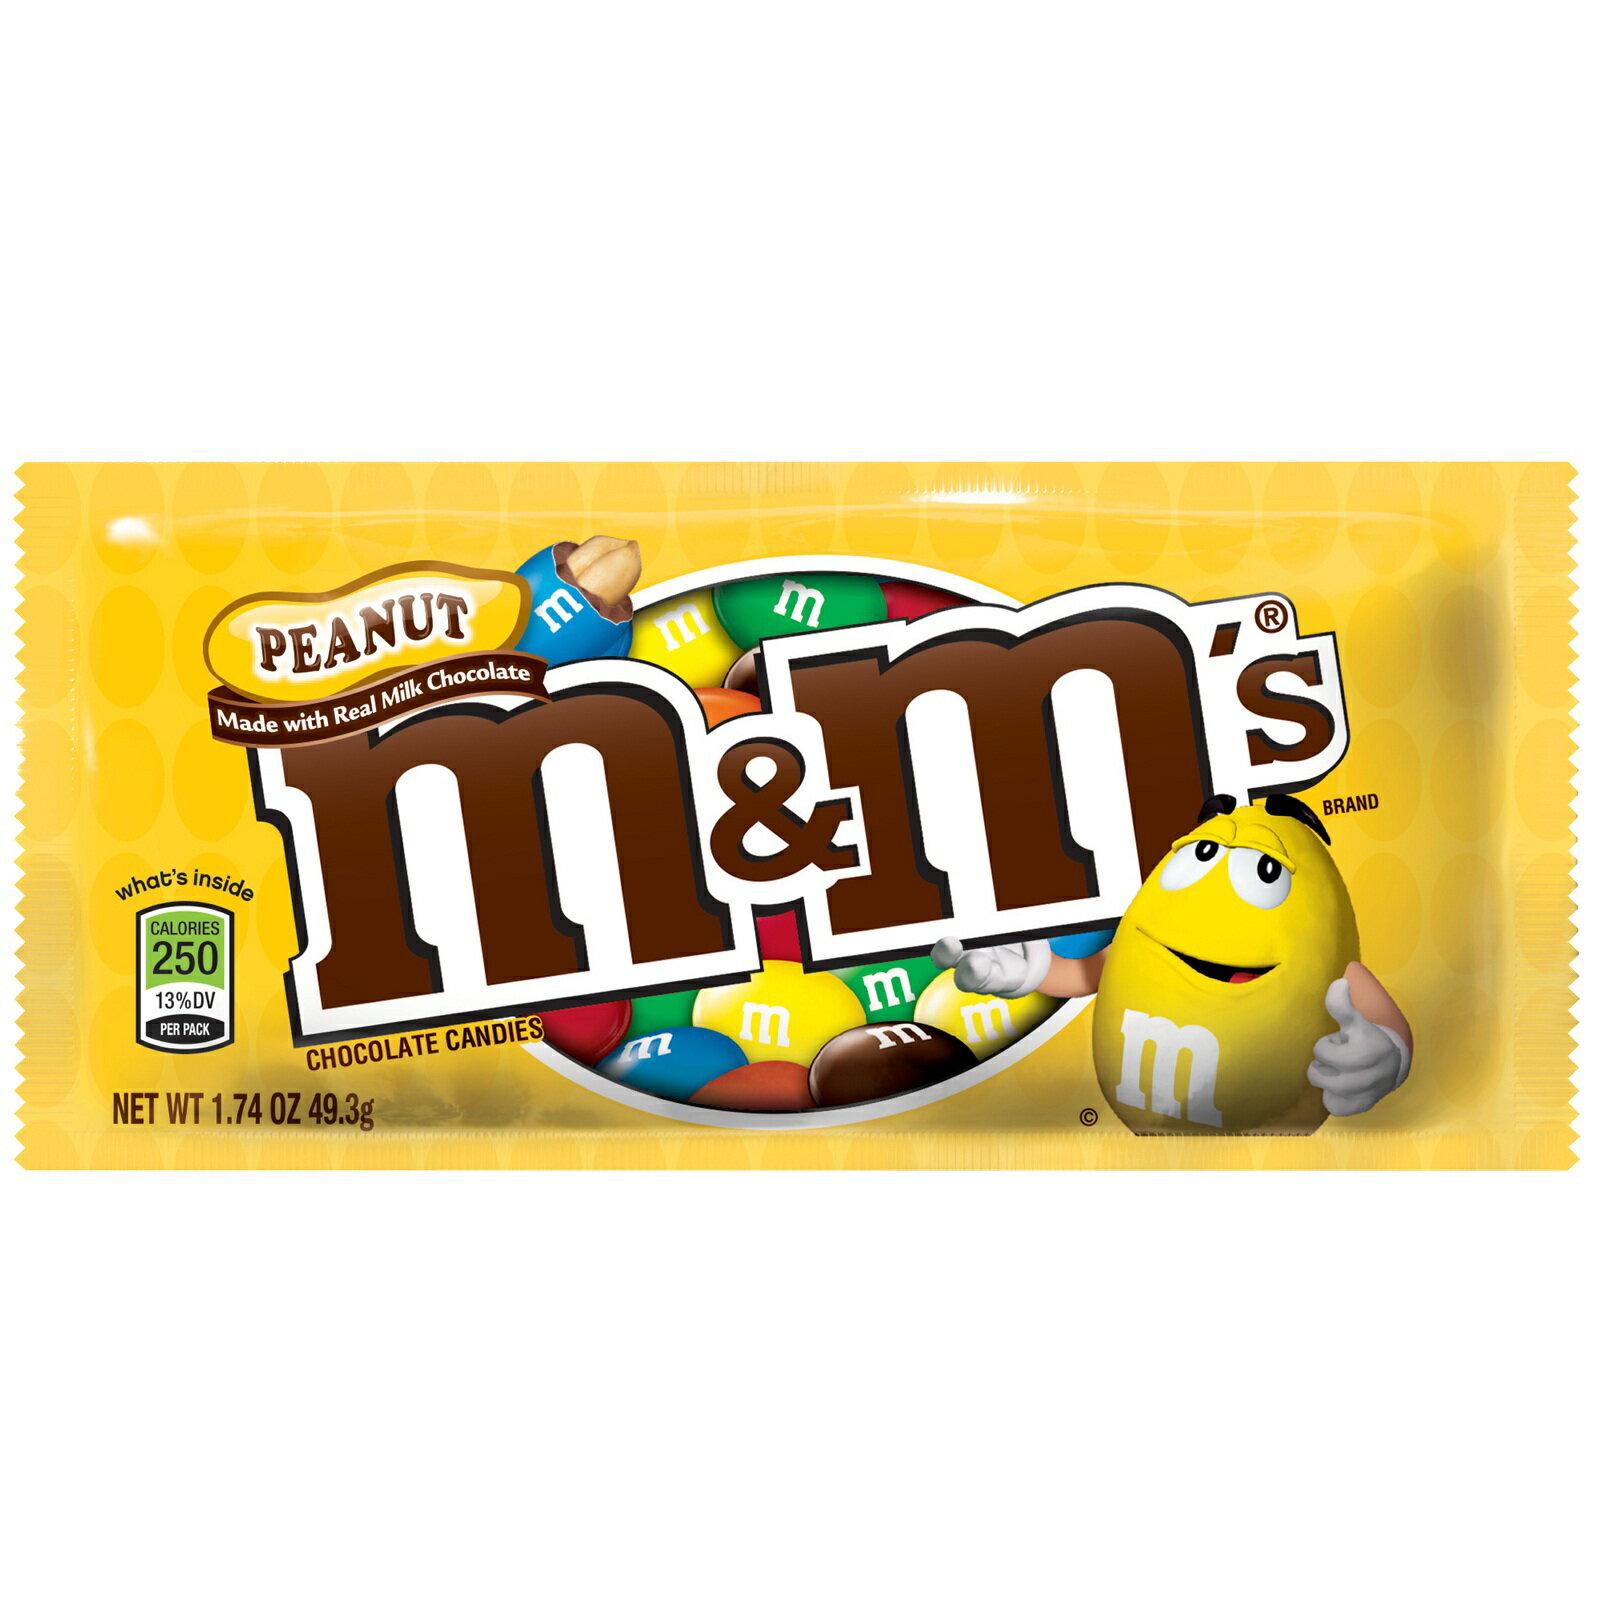 M&M巧克力系列★89折★可分次領取★超商取貨★全店兌換★送禮轉贈★電子票券【萊爾富pickup】